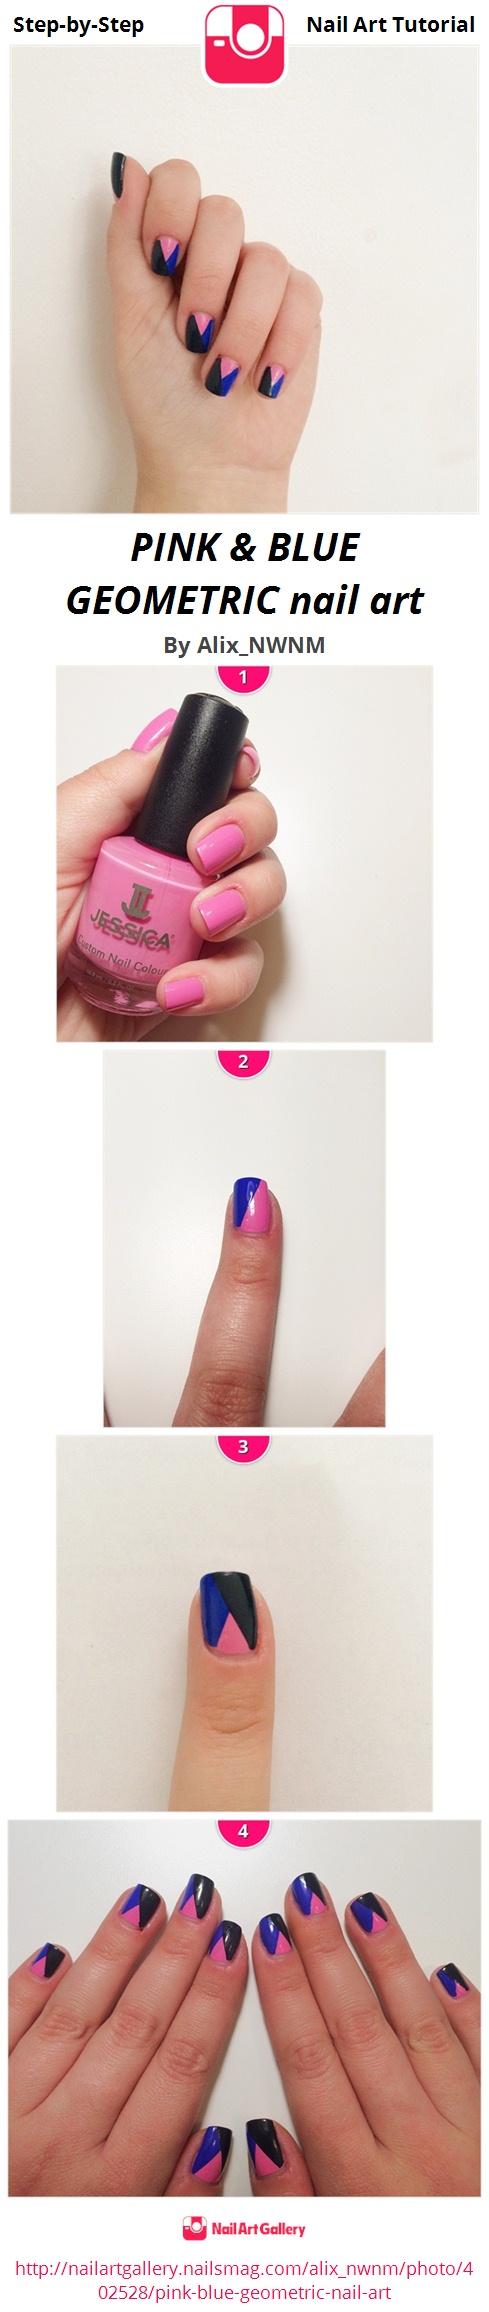 PINK & BLUE GEOMETRIC nail art - Nail Art Gallery